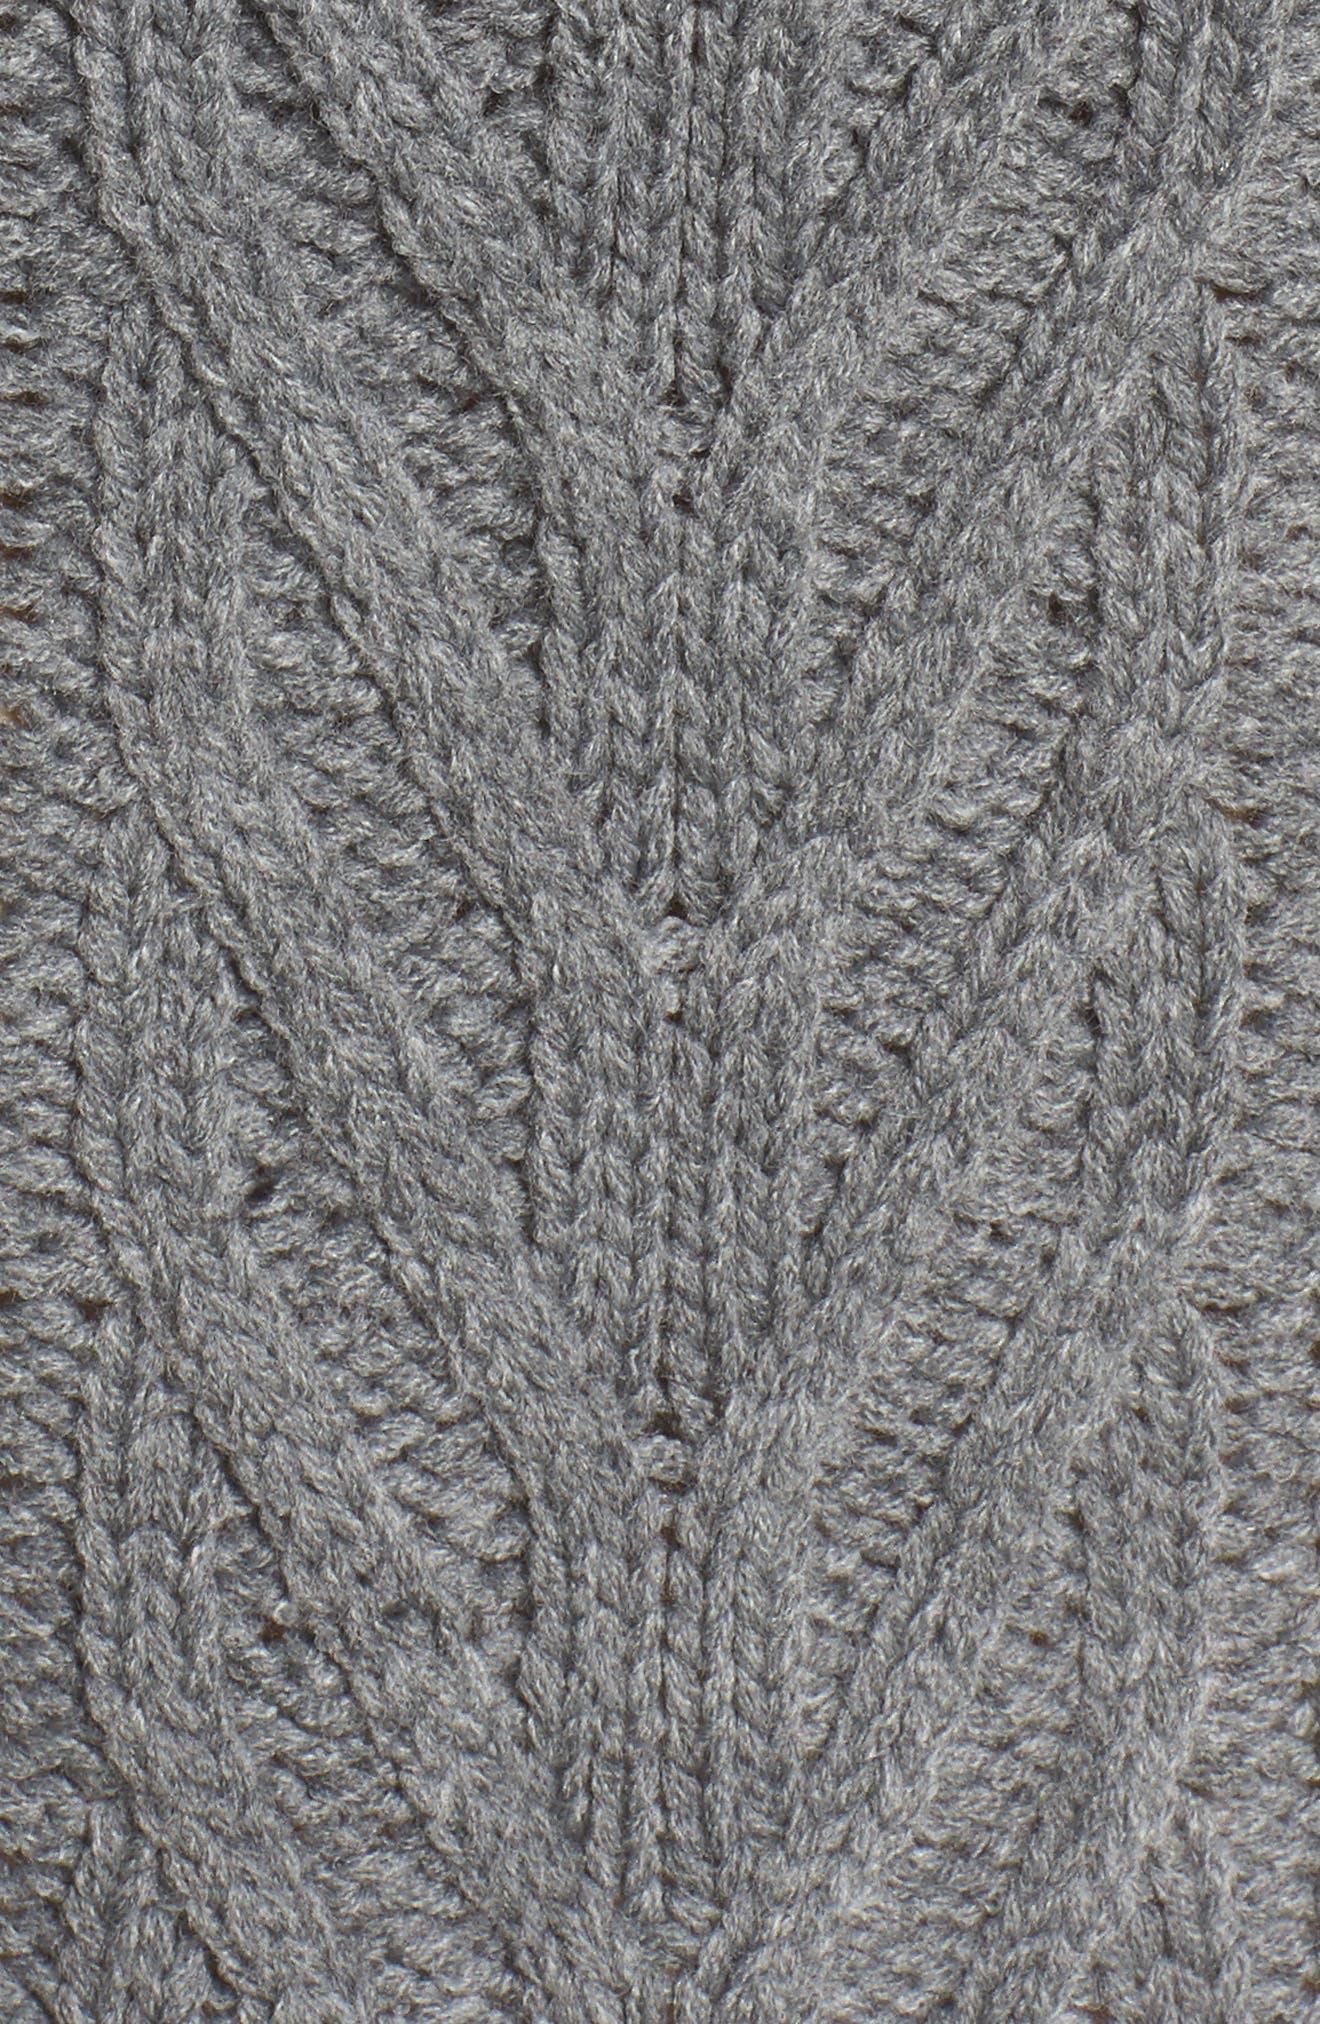 Cable Knit Turtleneck Sweater,                             Alternate thumbnail 5, color,                             020